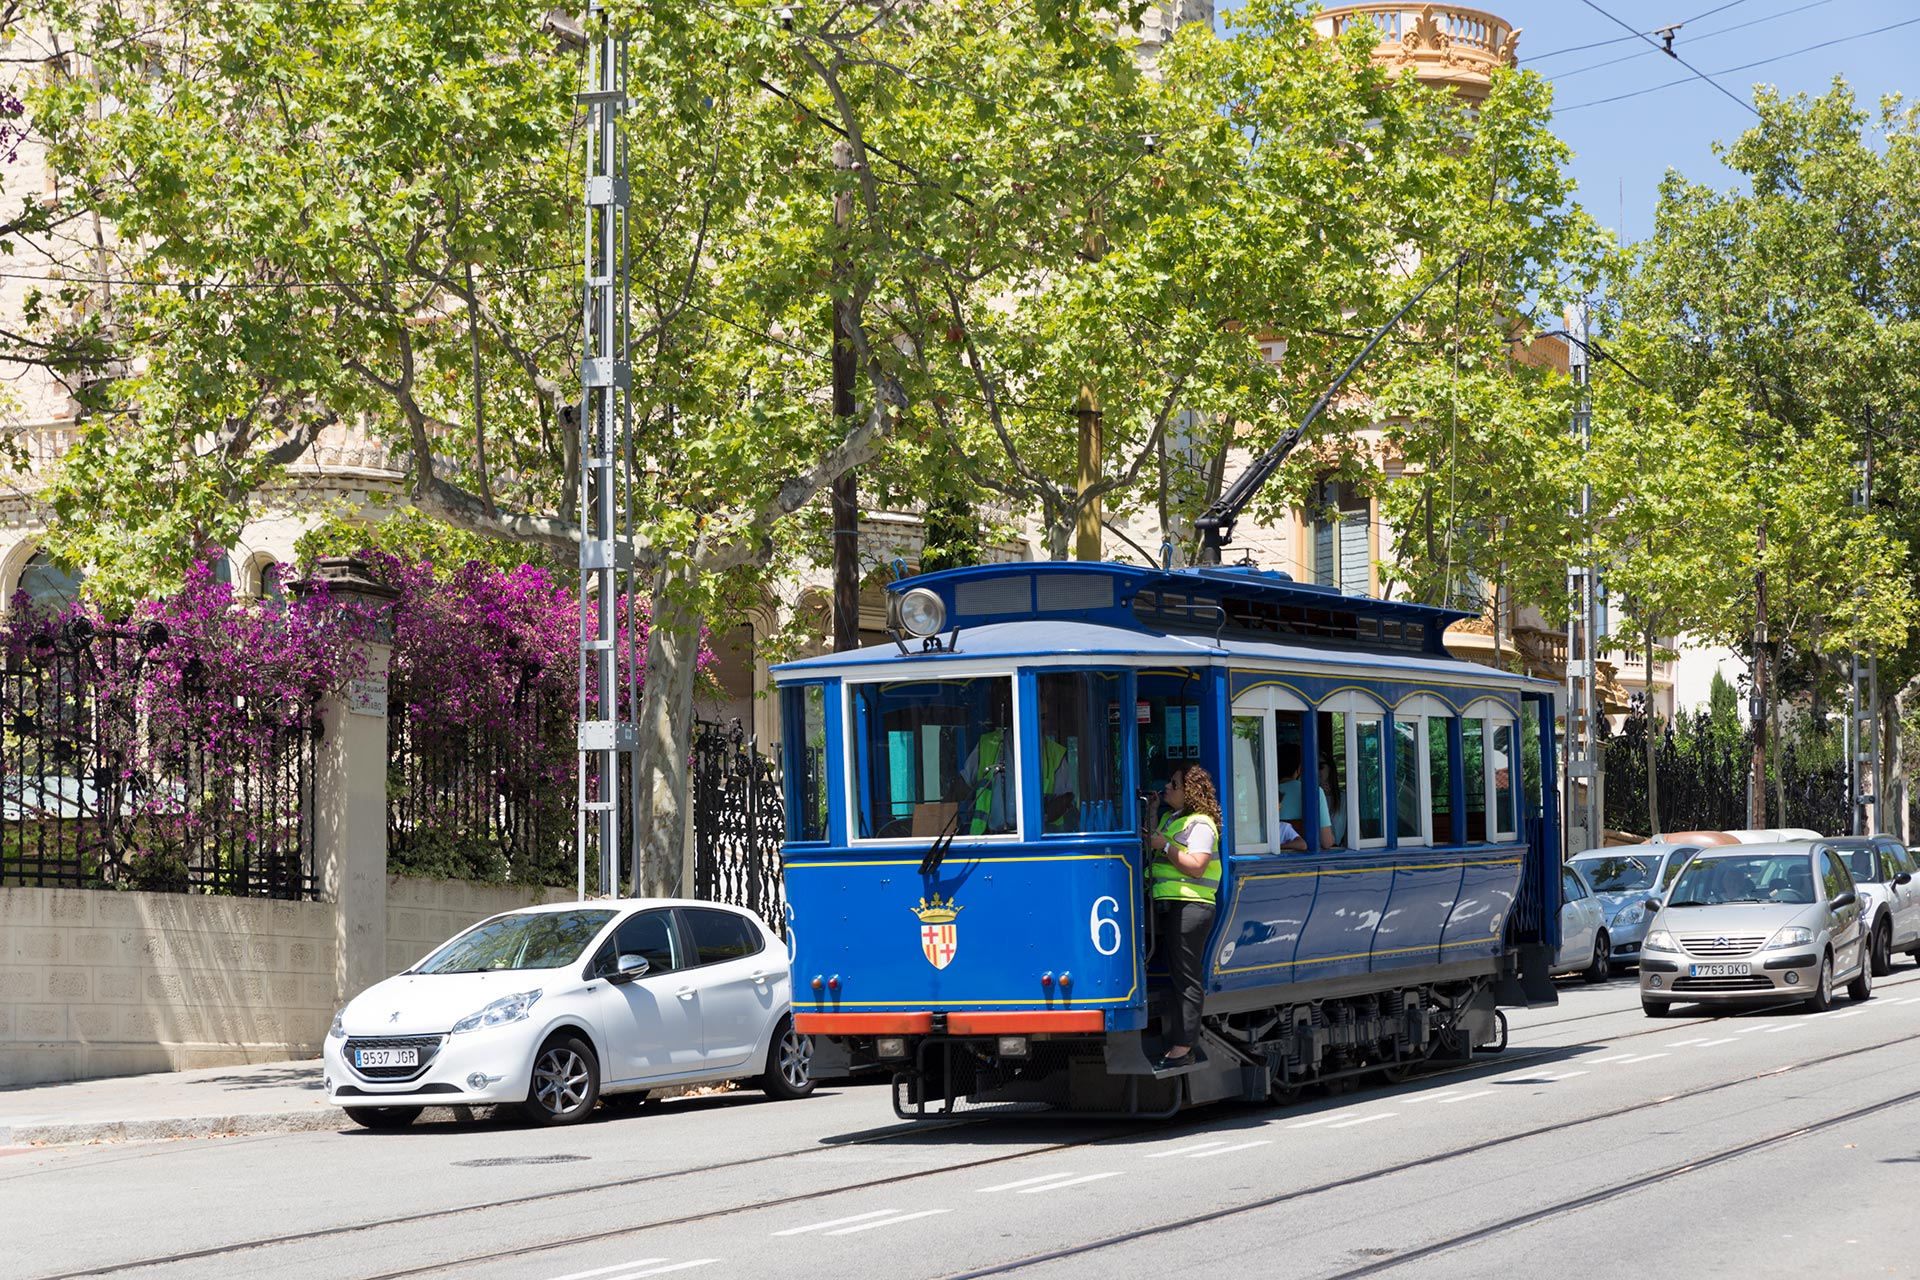 Tram Via Blau eli Sininen raitiovaunu © Tuulia Kolehmainen